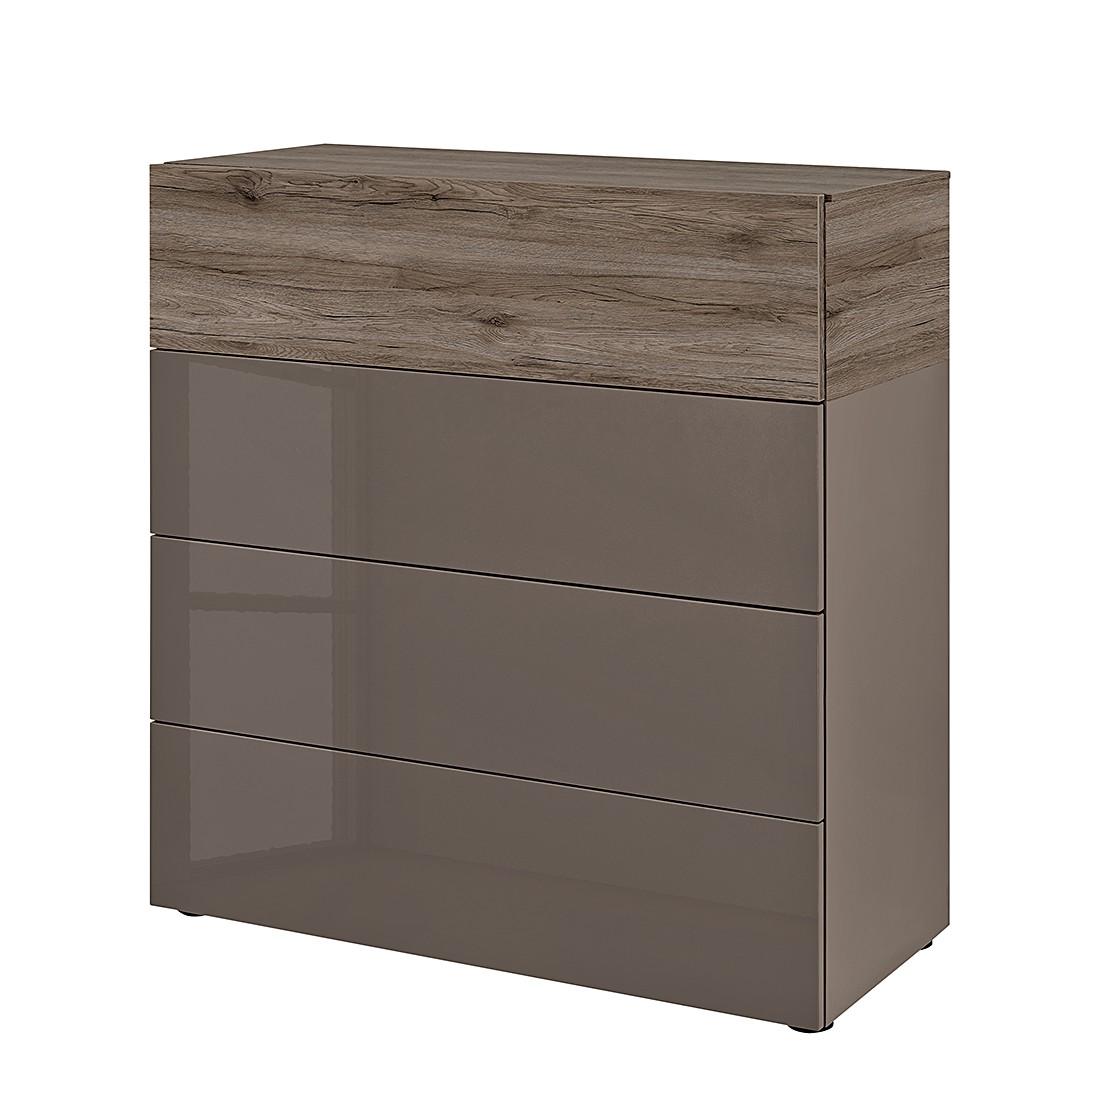 kommode beam iv cubanit hochglanz cubanit eiche dunkel dekor arte m jetzt bestellen. Black Bedroom Furniture Sets. Home Design Ideas